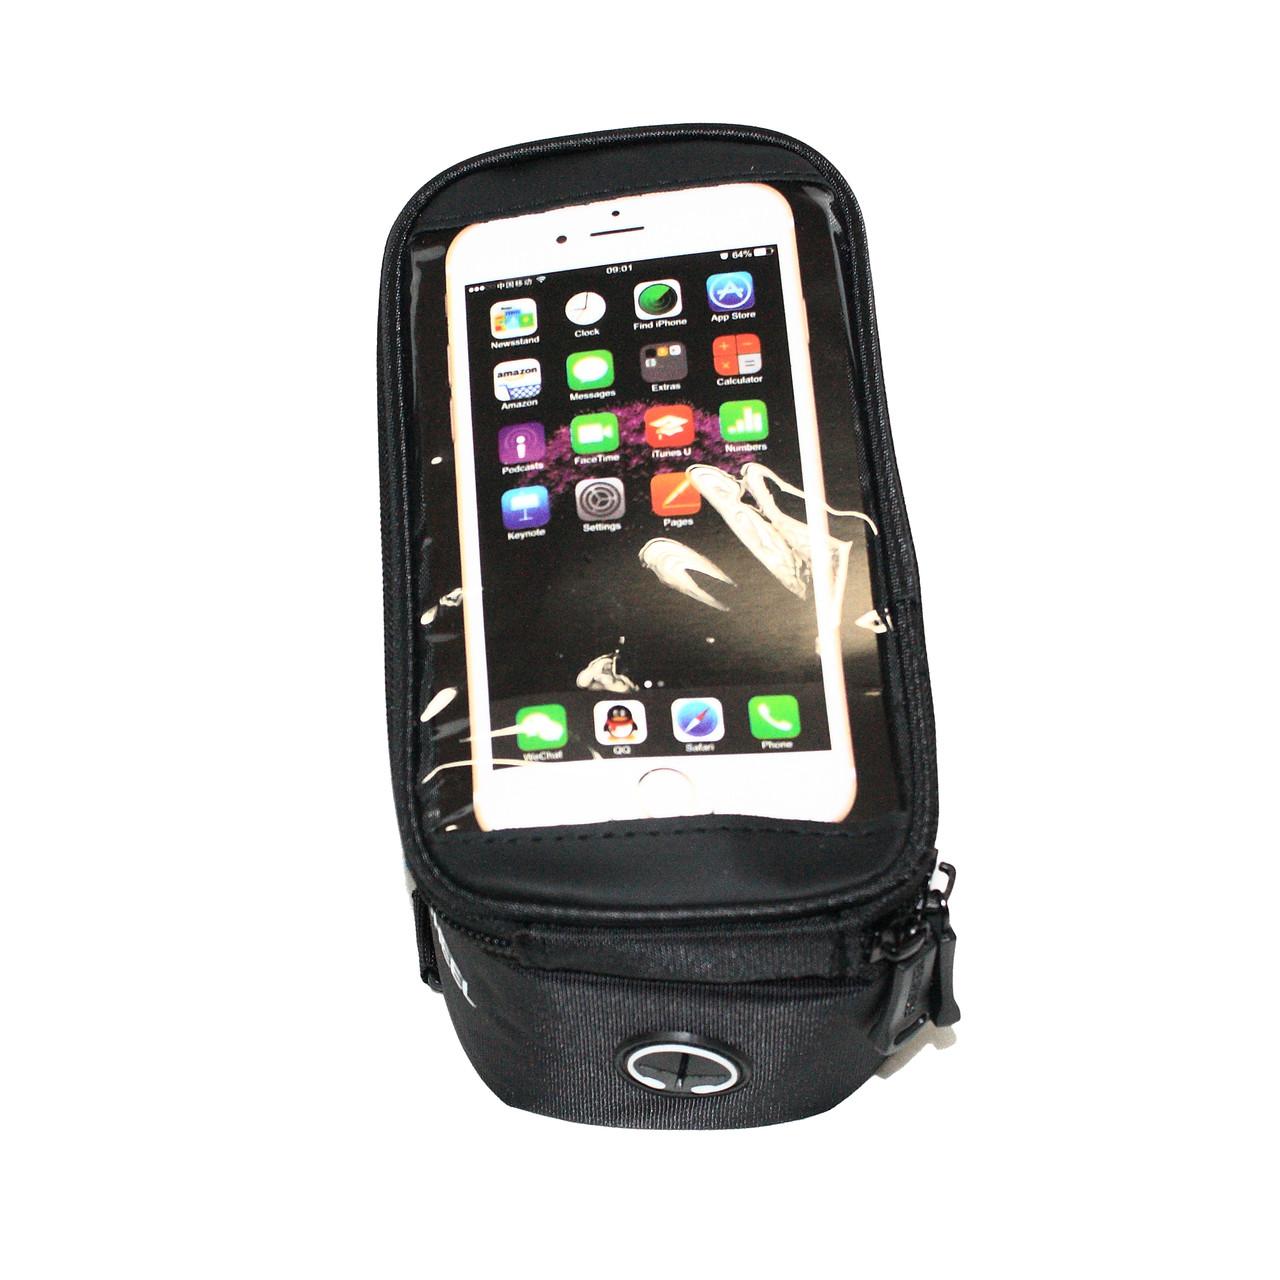 Сумка на раму ROSWHEEL для инструмента и смартфона 5.5″, (GA-43)